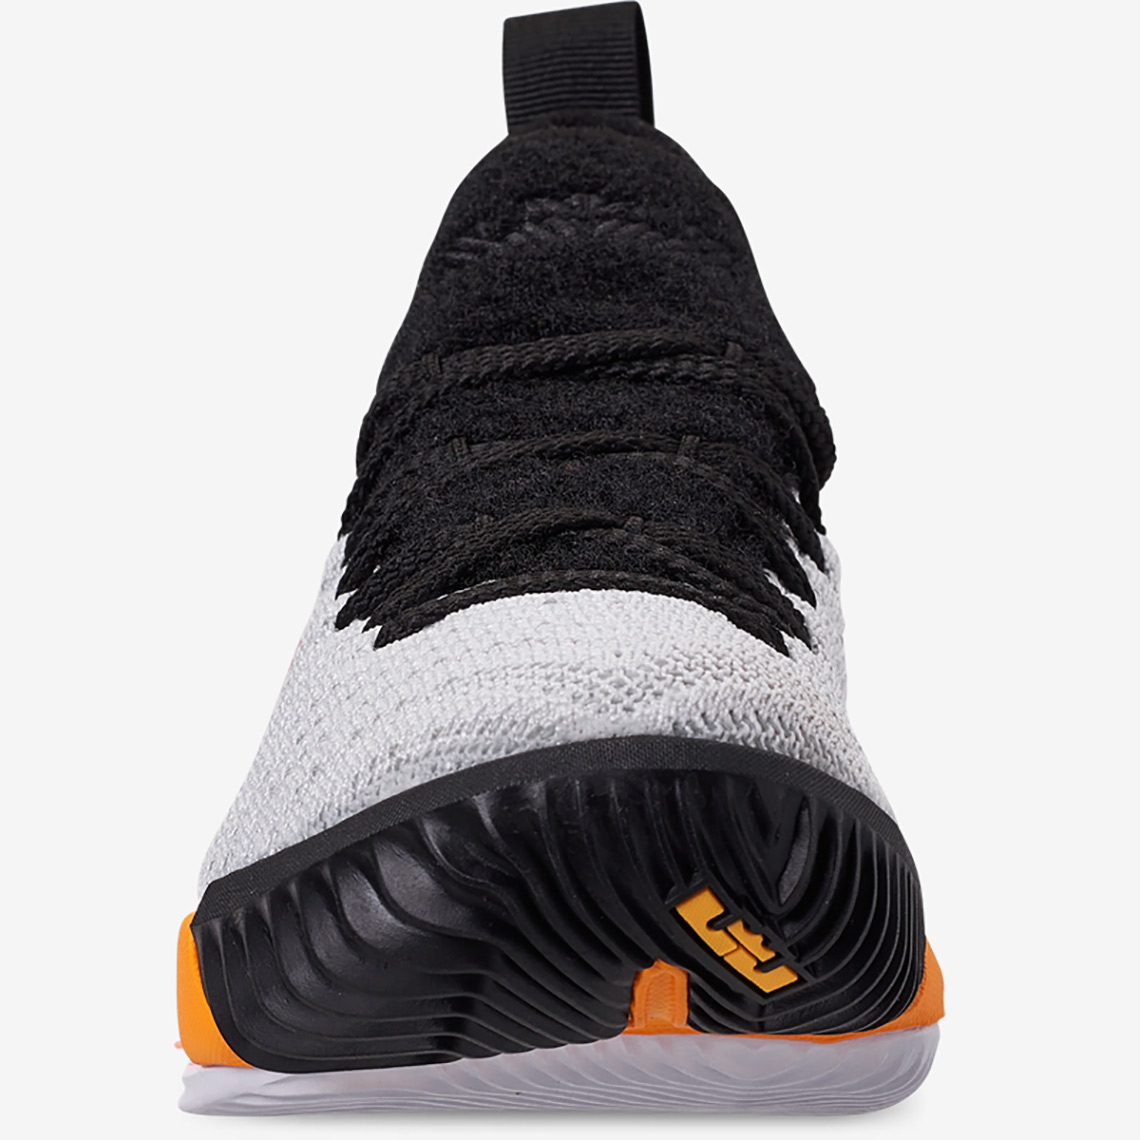 factory price a02e0 10e86 Nike LeBron 16 Kids AQ2465-188 Release Info   SneakerNews.com